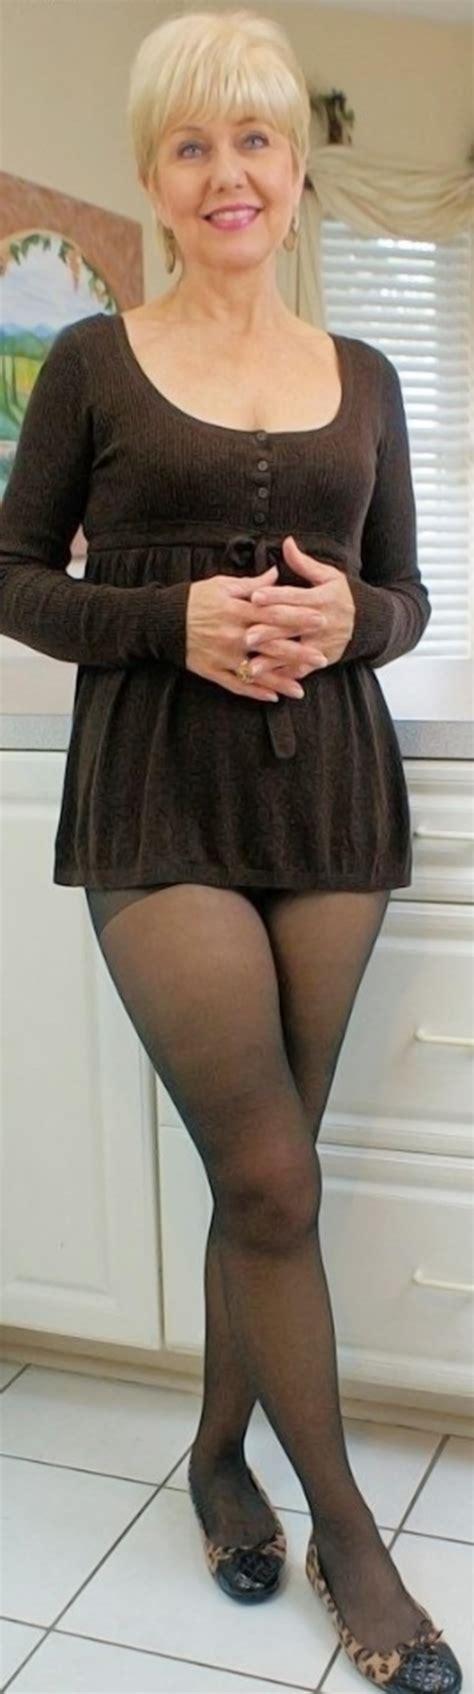 mature pinterest hot gilf mature eye candy pinterest stockings woman